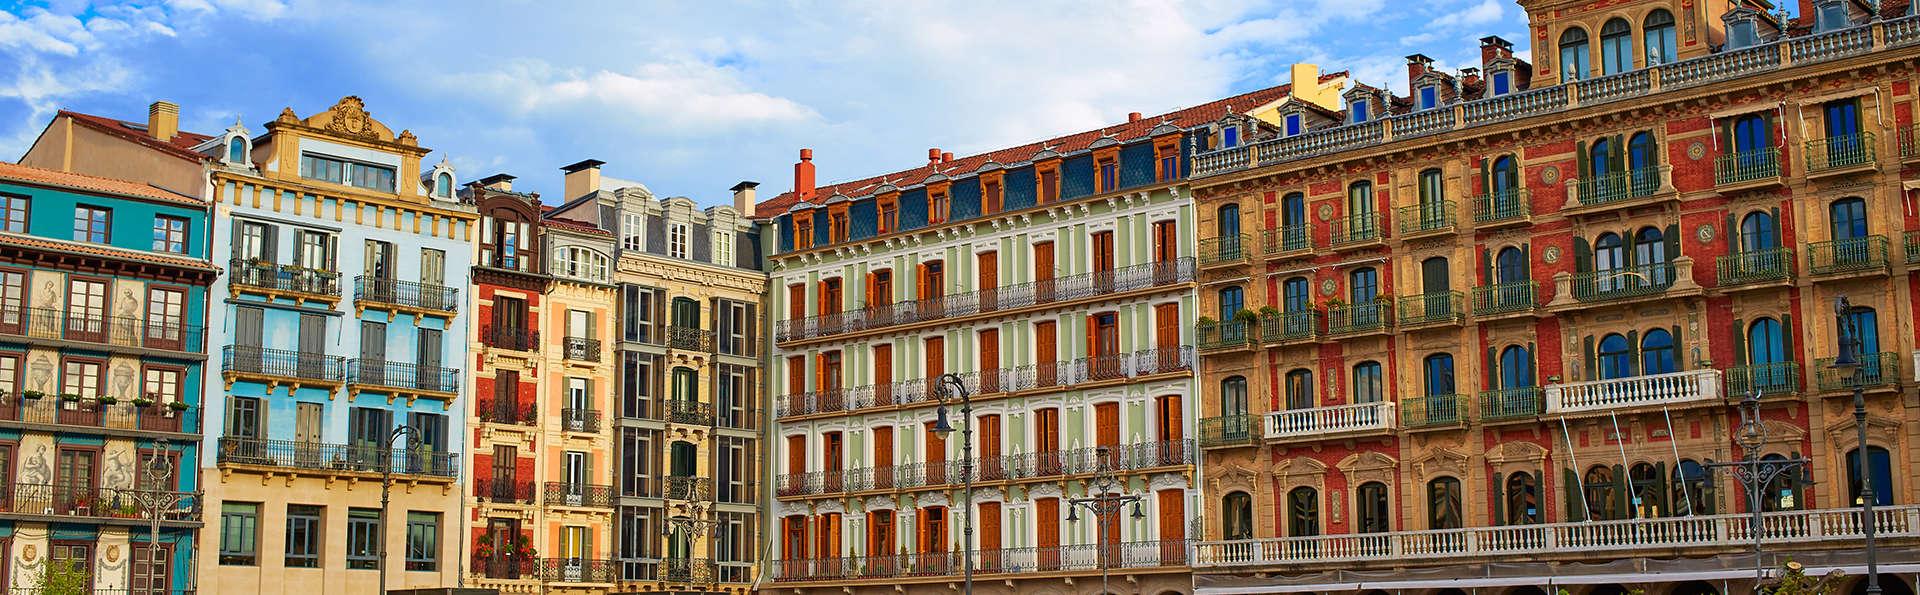 Hotel Tres Reyes  - Edit_Pamplona2.jpg